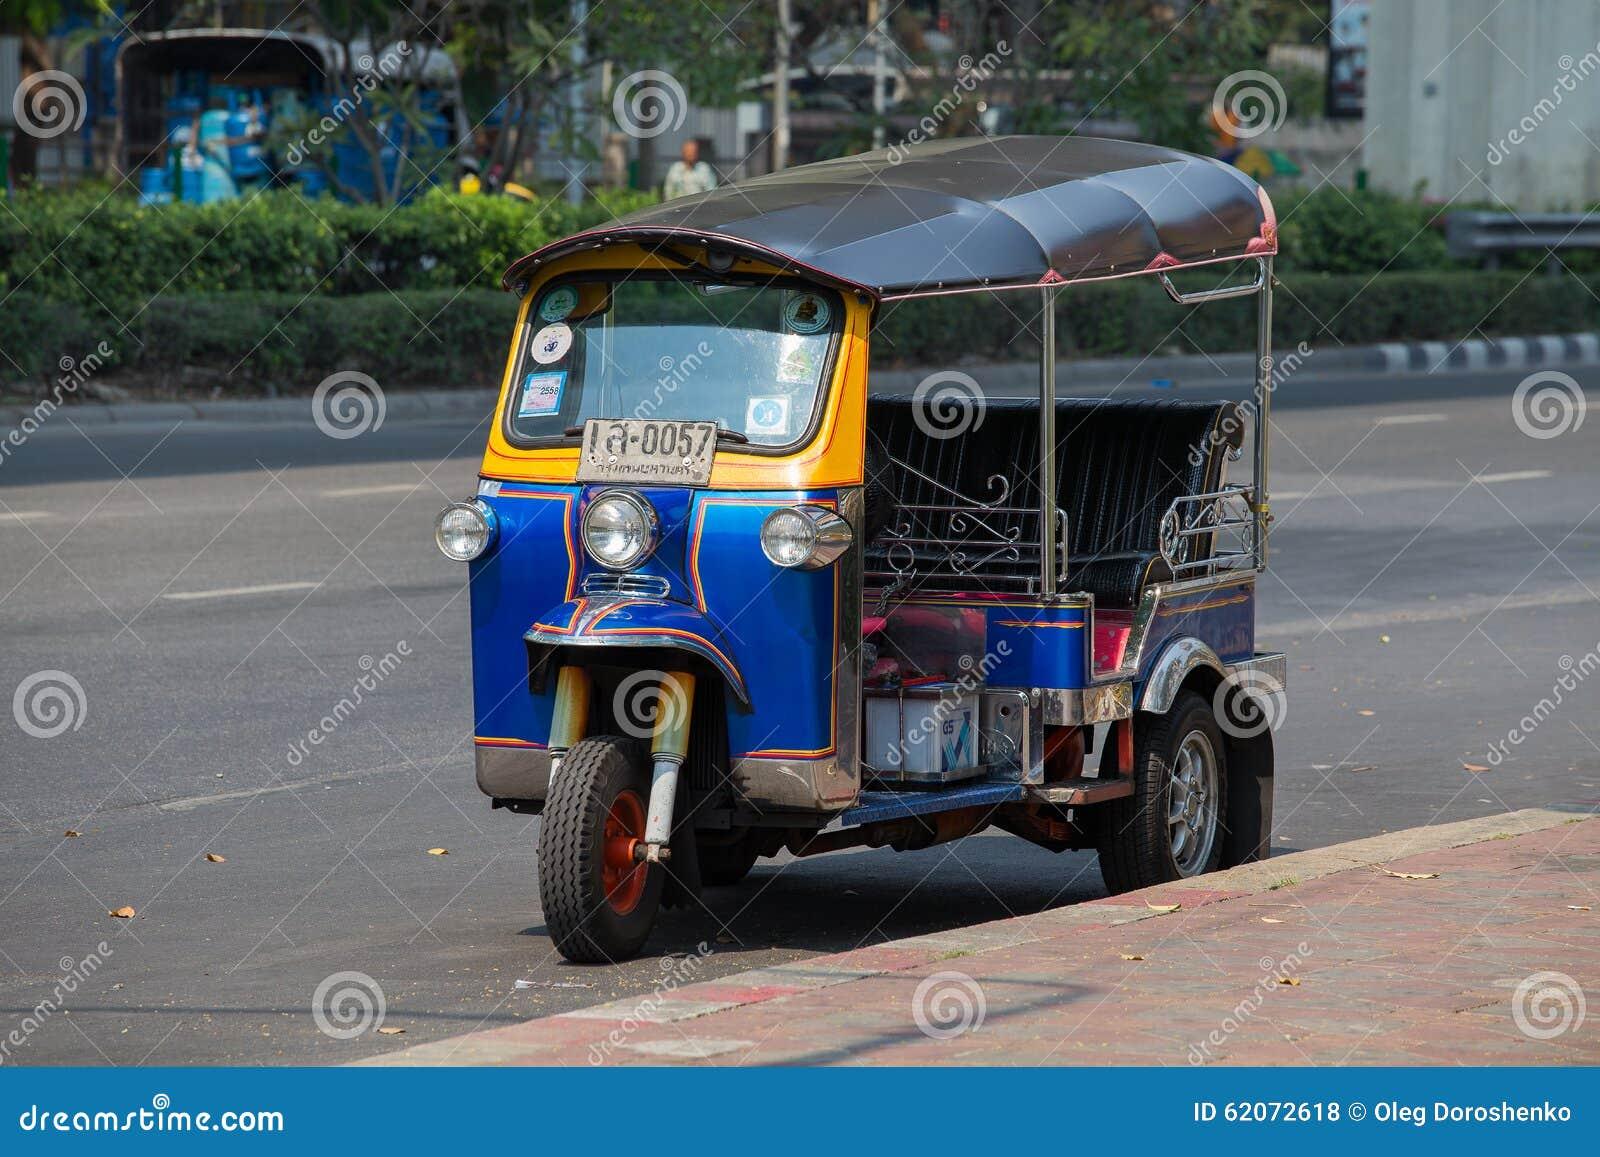 Hire Car Thailand Bangkok